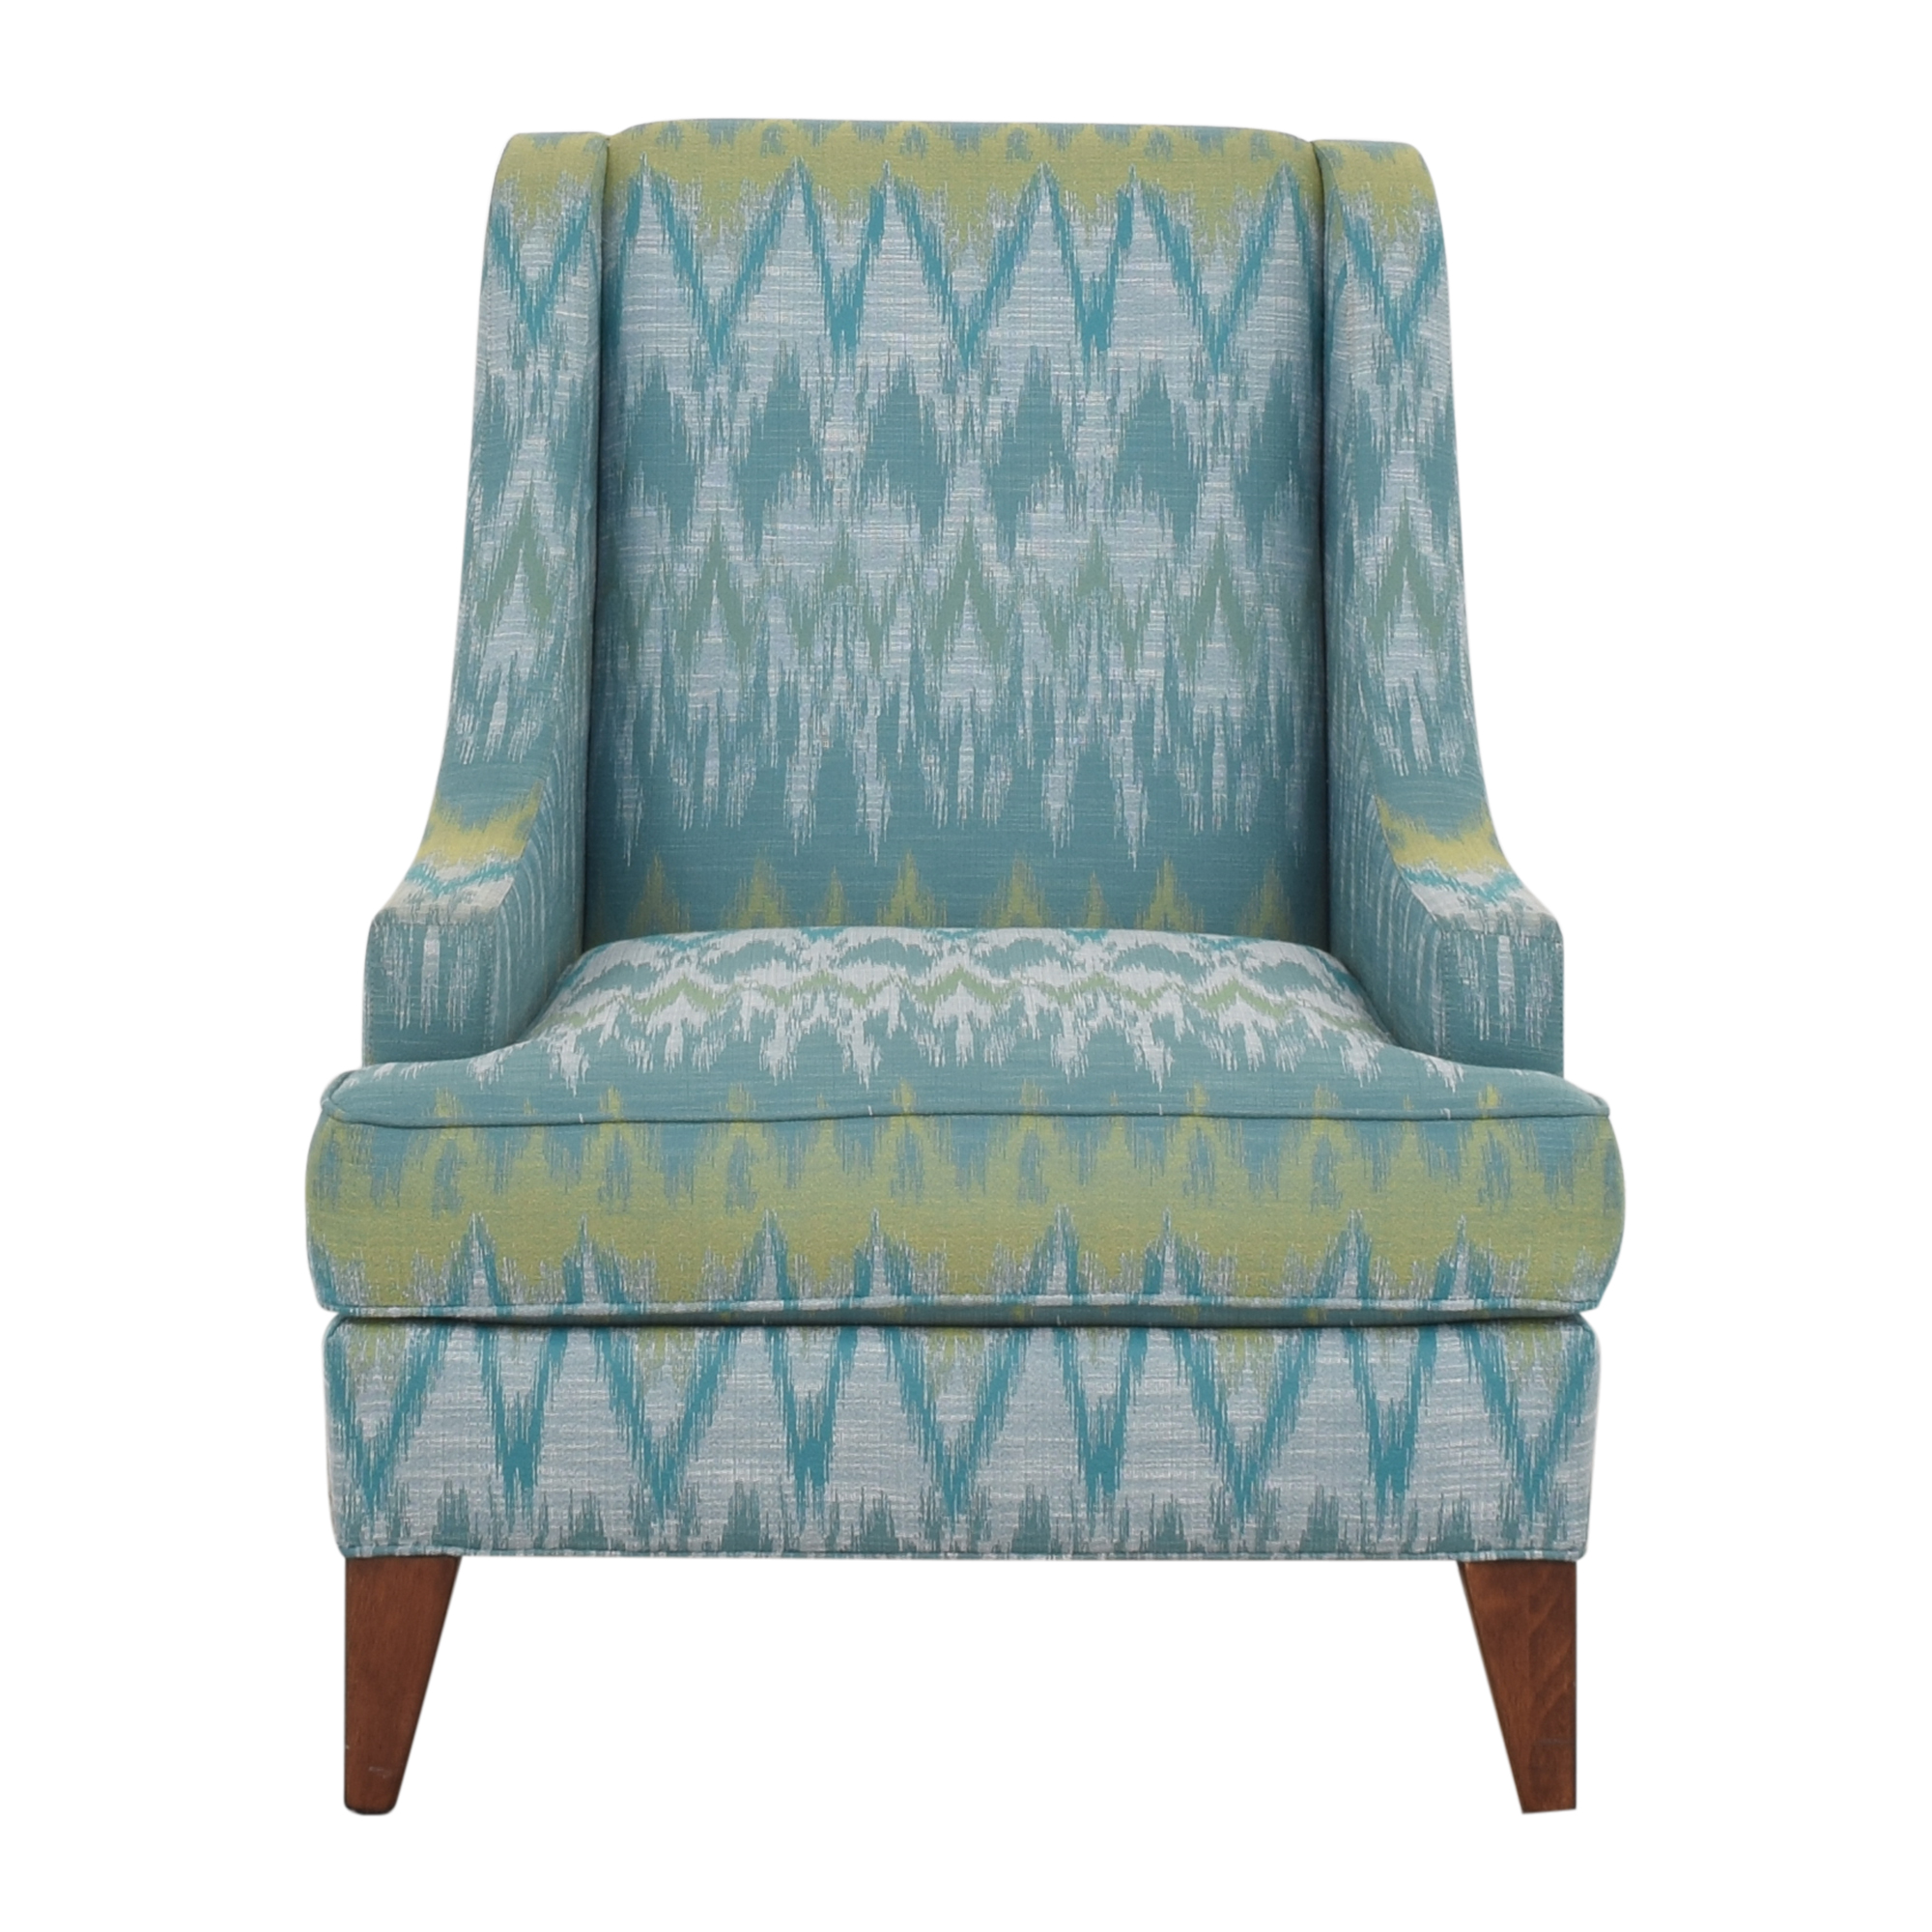 buy Ethan Allen Emerson Chair Ethan Allen